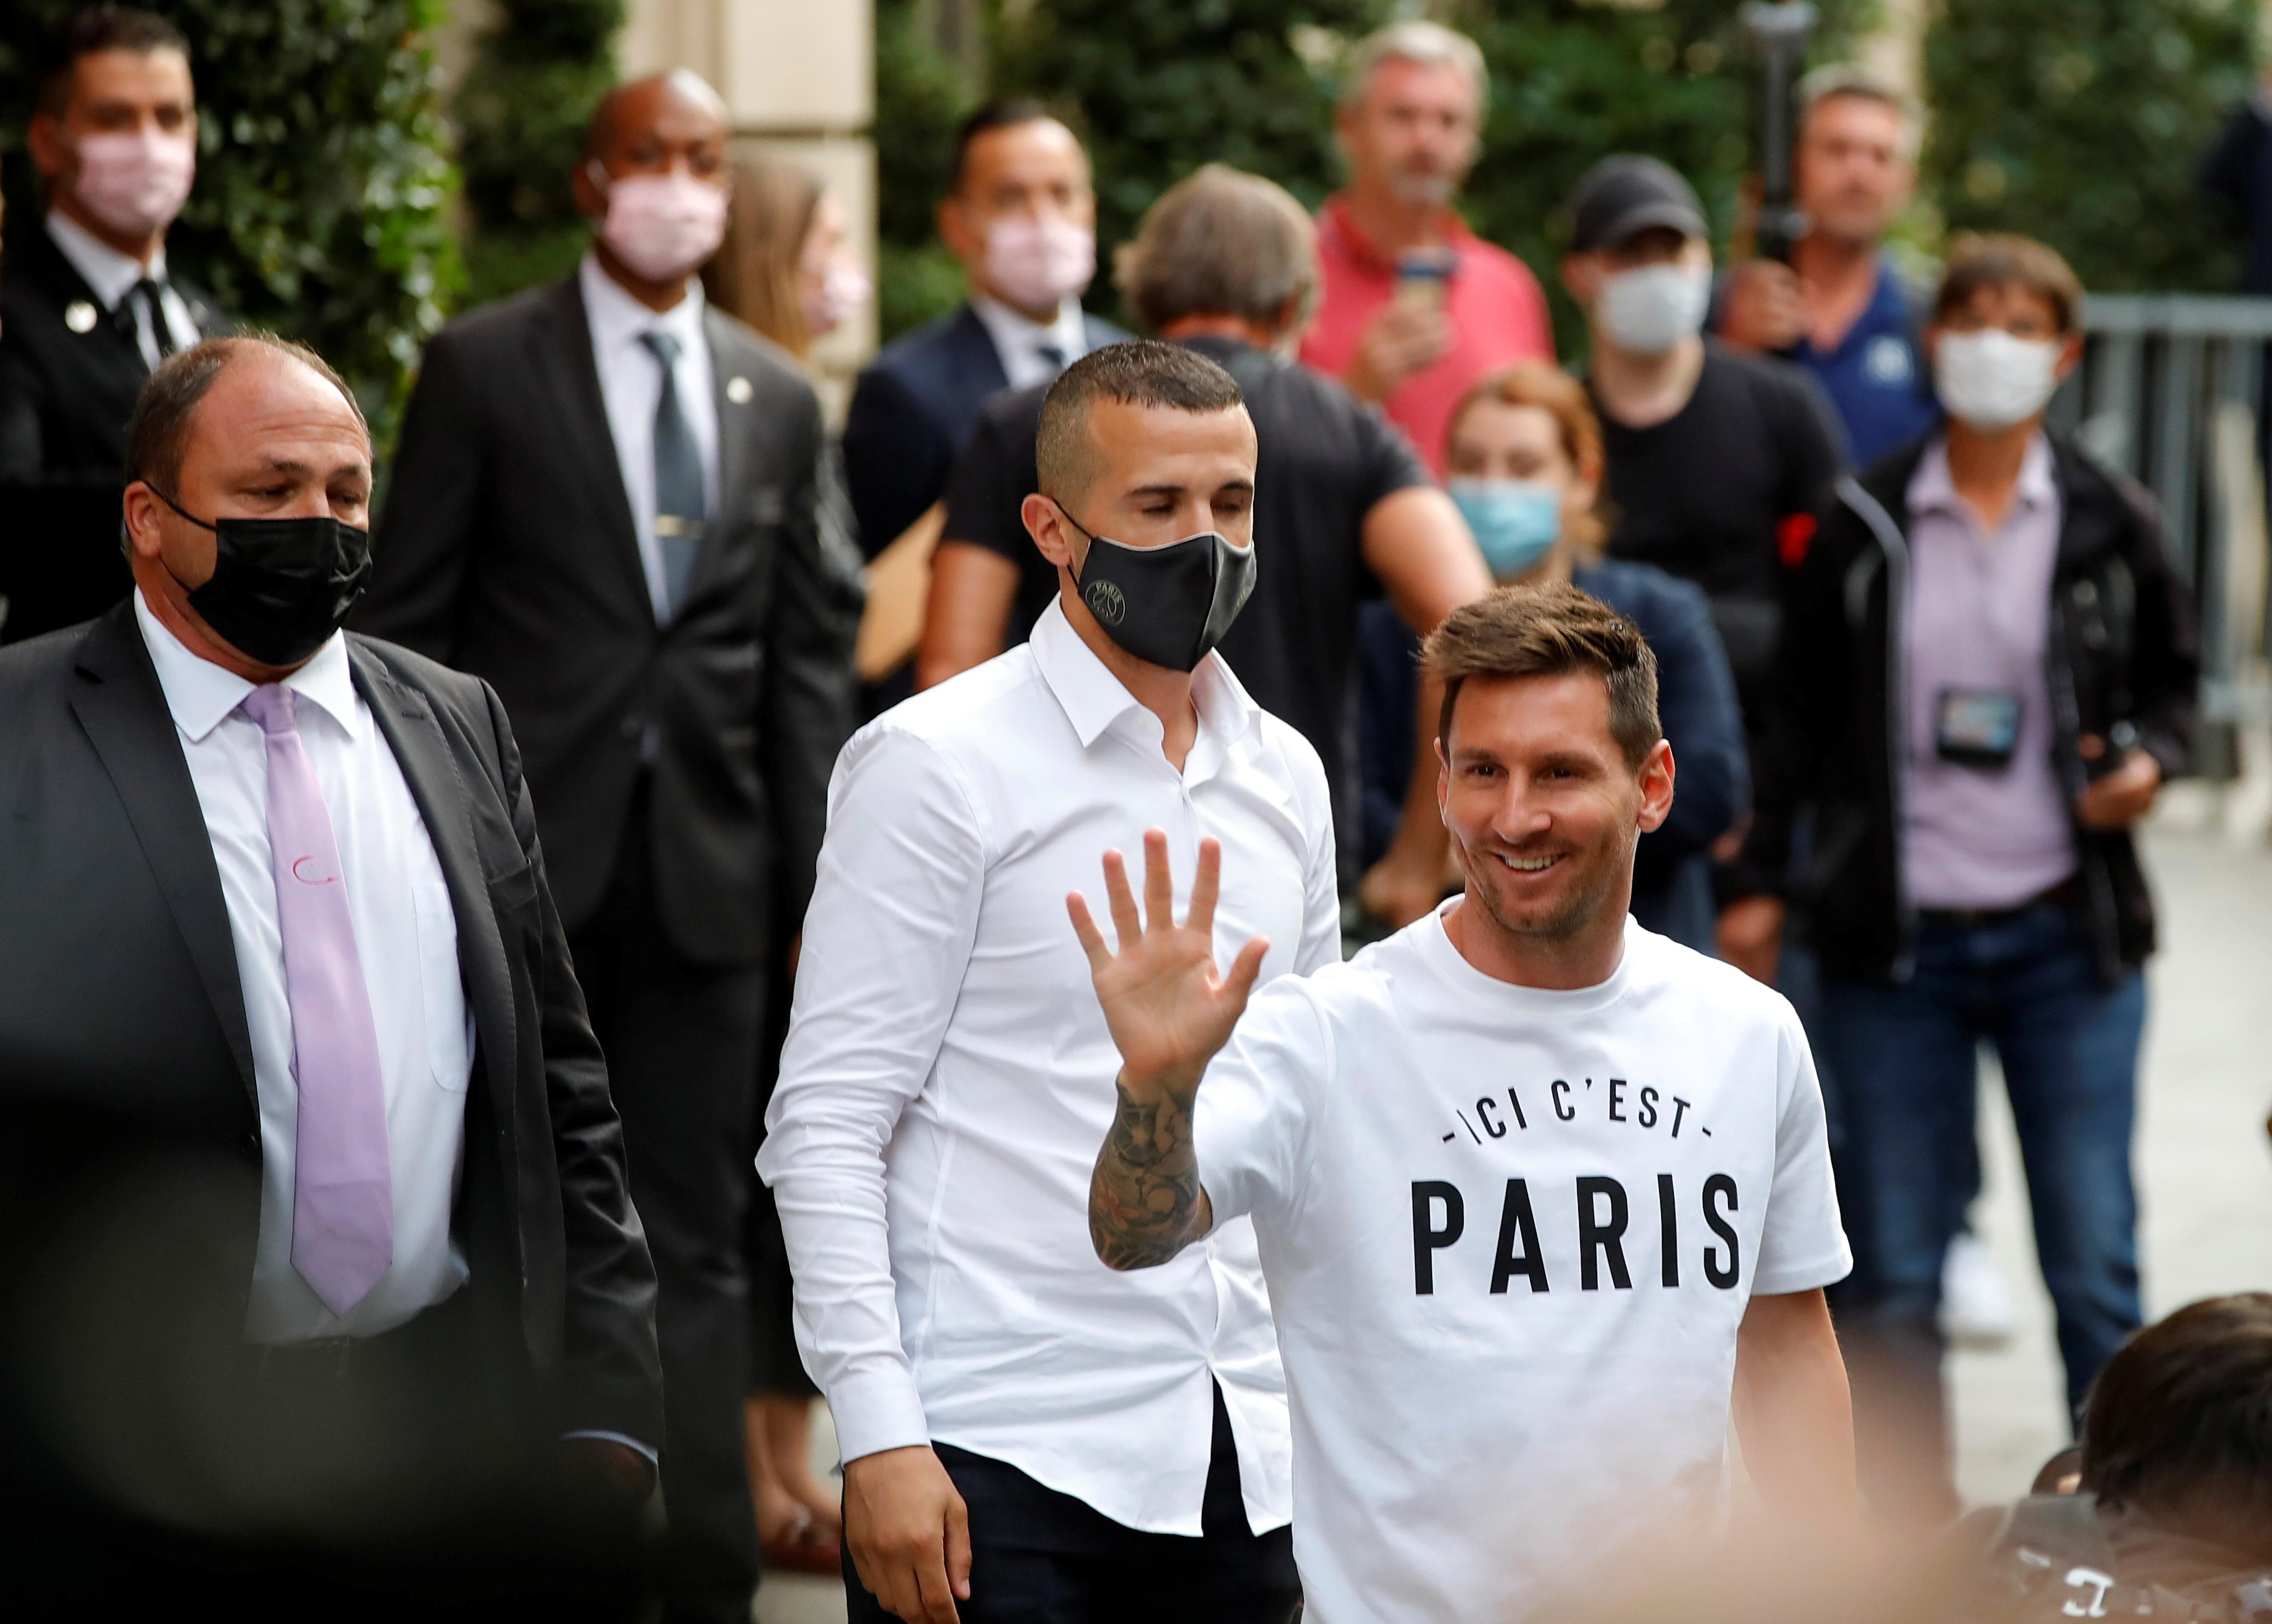 Soccer Football - Lionel Messi arrives in Paris to join Paris St Germain - Paris, France - August 10, 2021  Lionel Messi arrives at the Royal Monceau Hotel REUTERS/Sarah Meyssonnier/File Photo